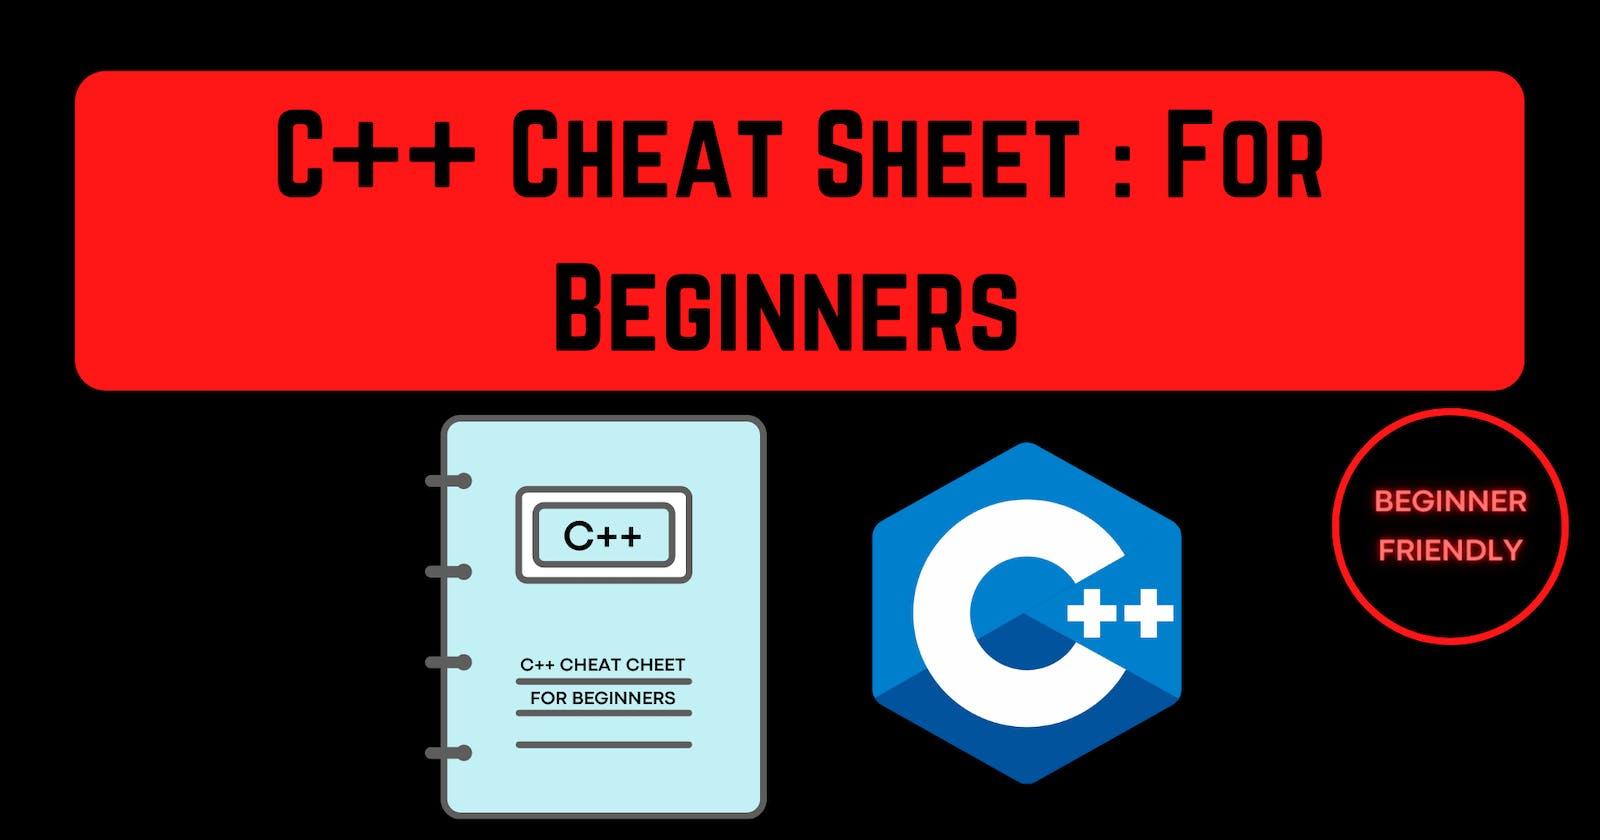 C++ Cheat Sheet : For Beginners